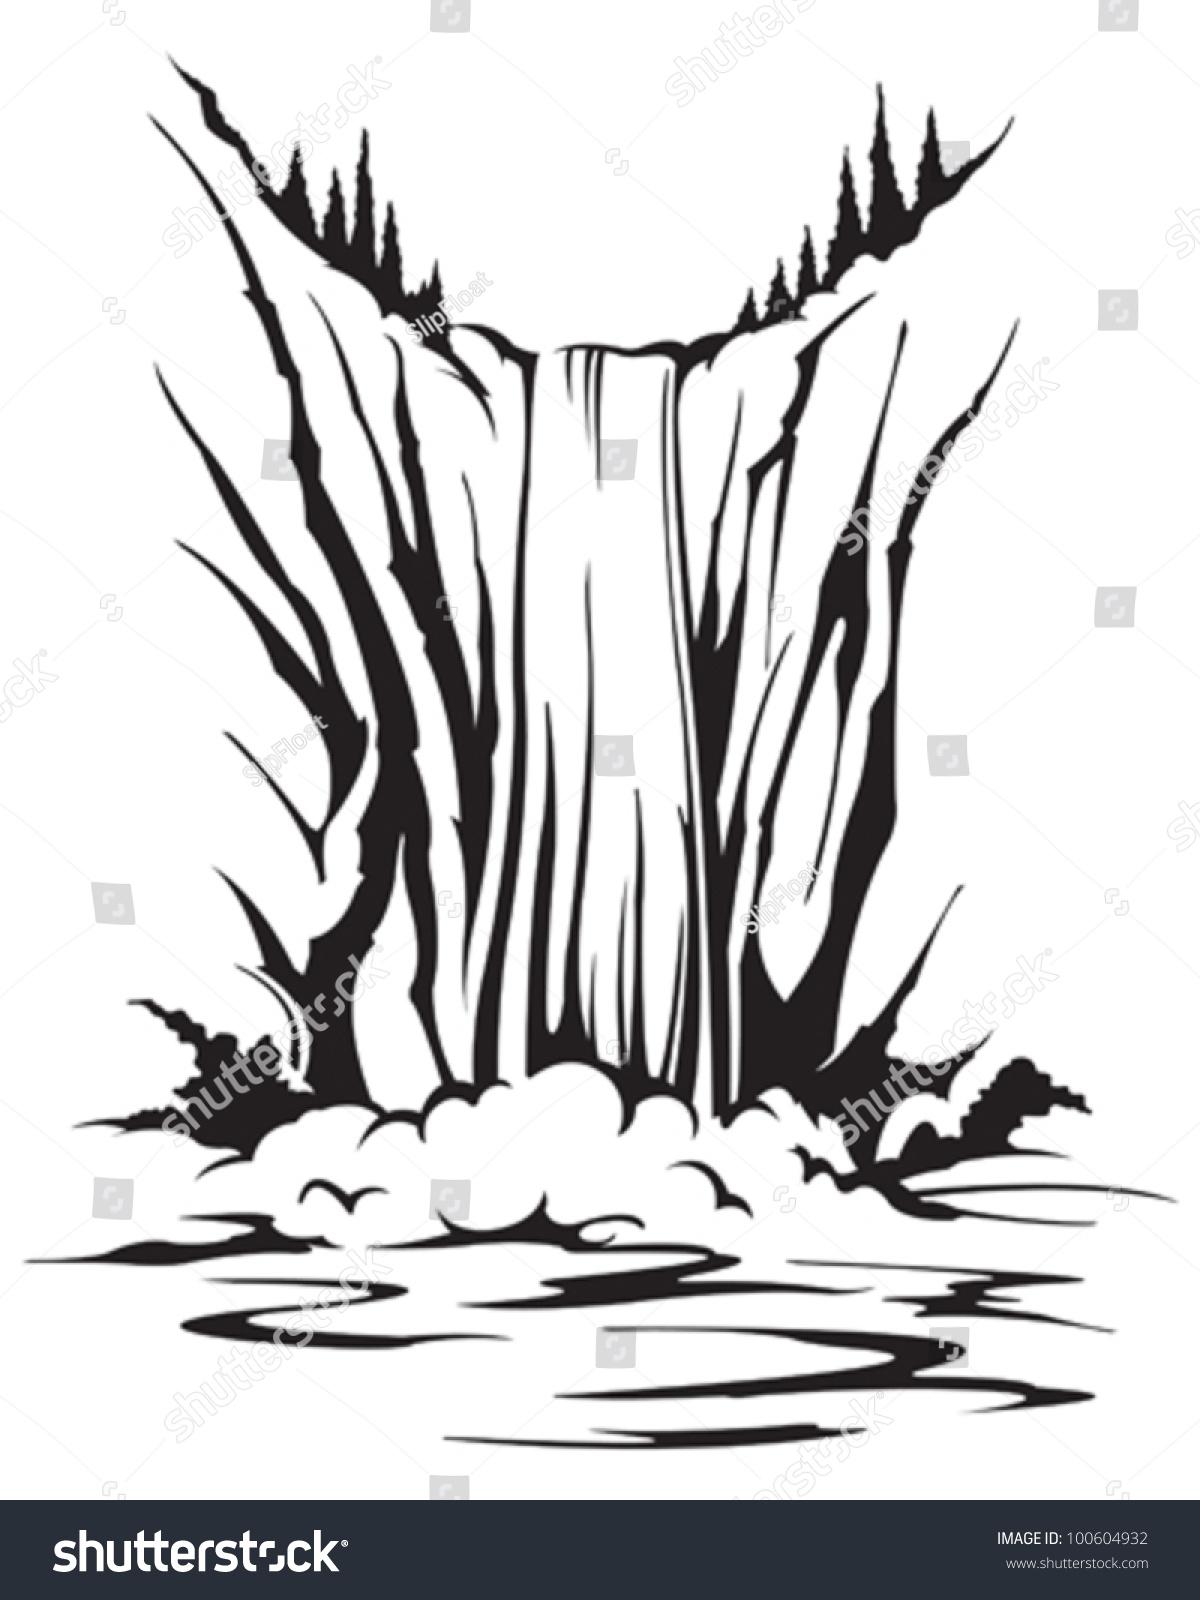 Line Drawing Waterfall : Waterfall stock vector illustration shutterstock